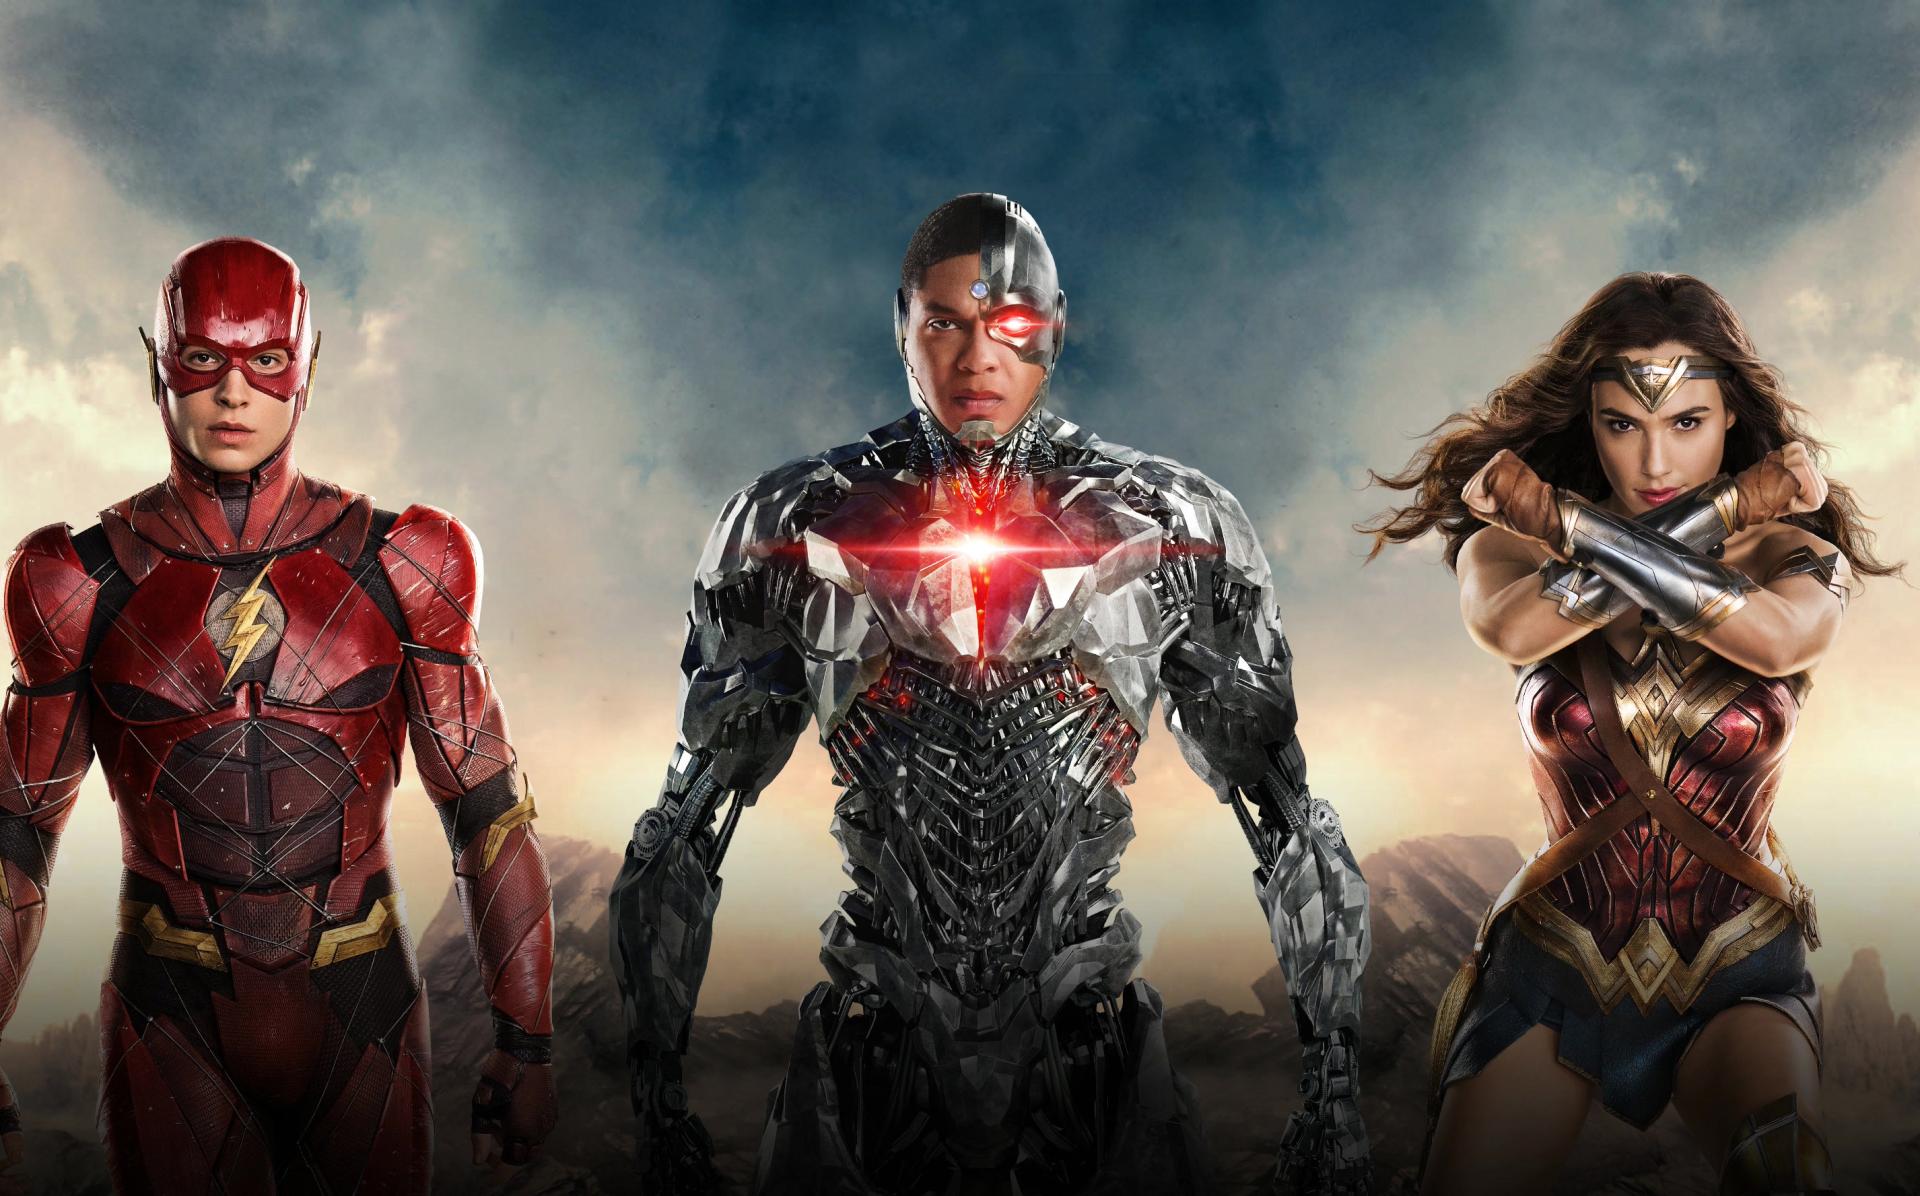 Justice League Wallpaper 2017